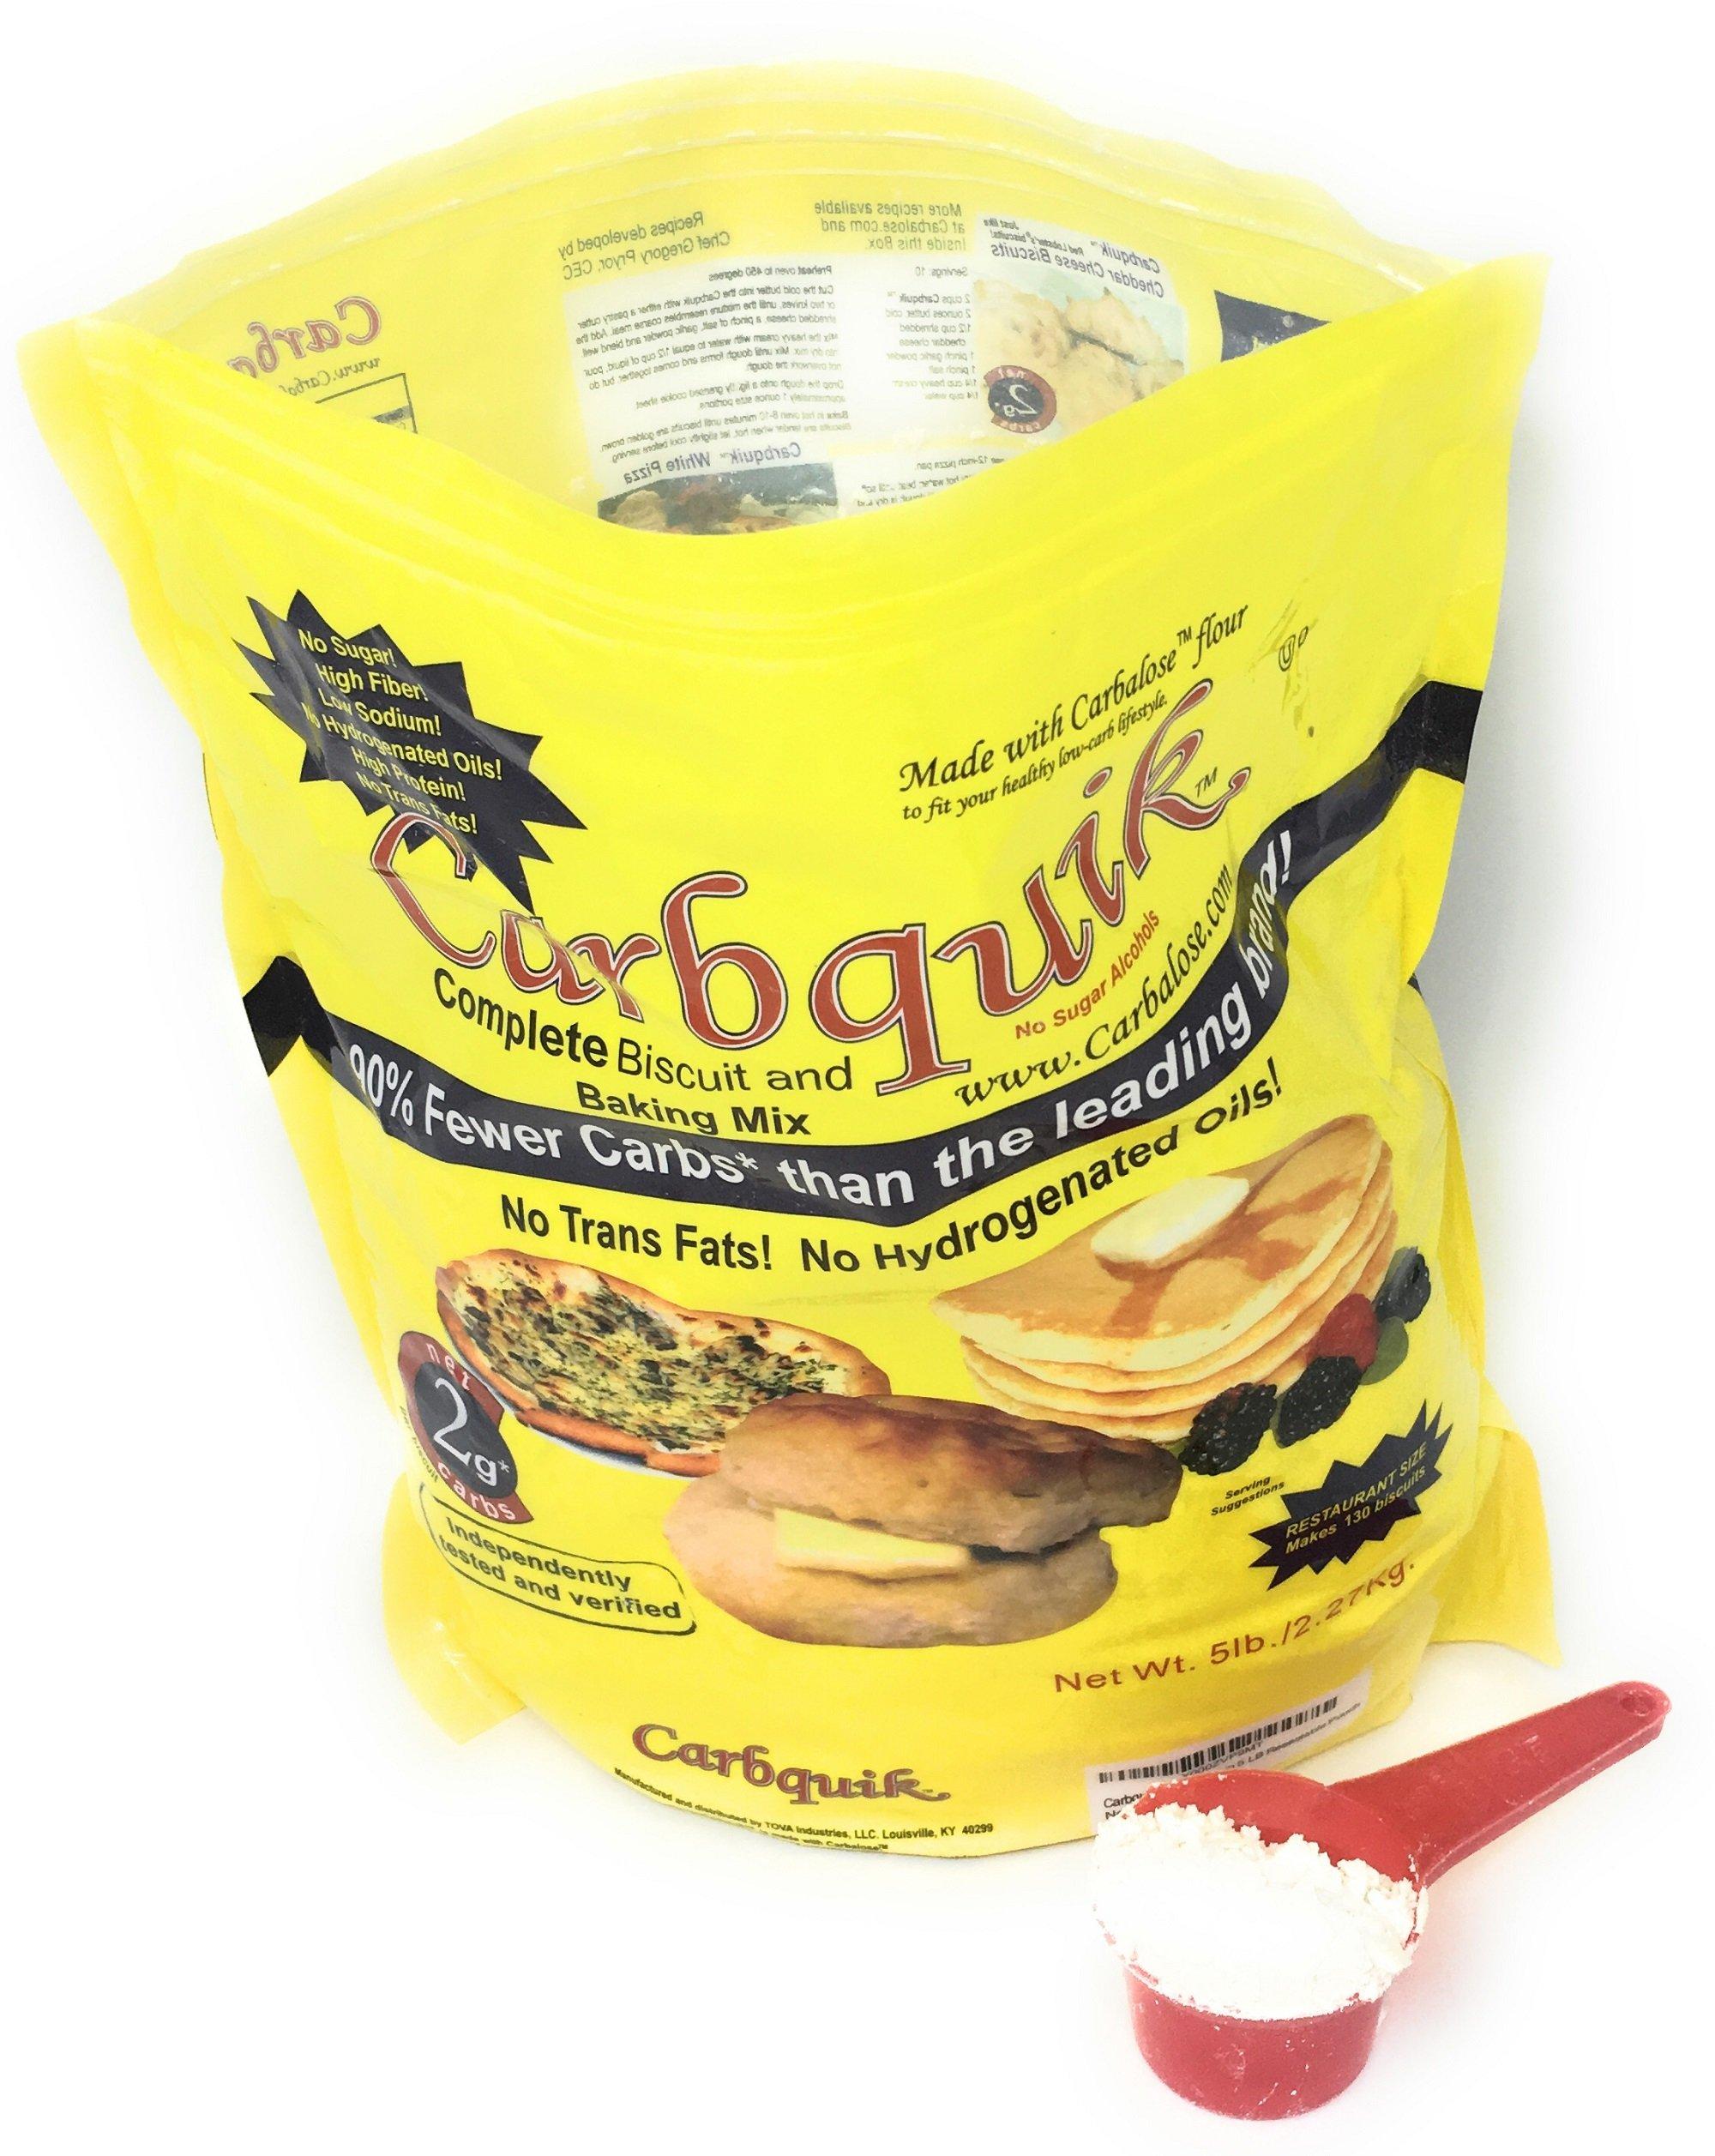 Carbquik Baking Mix 5 Pounds Convenient Resealable Pouch Keto Diet Friendly by Carbquik (Image #4)